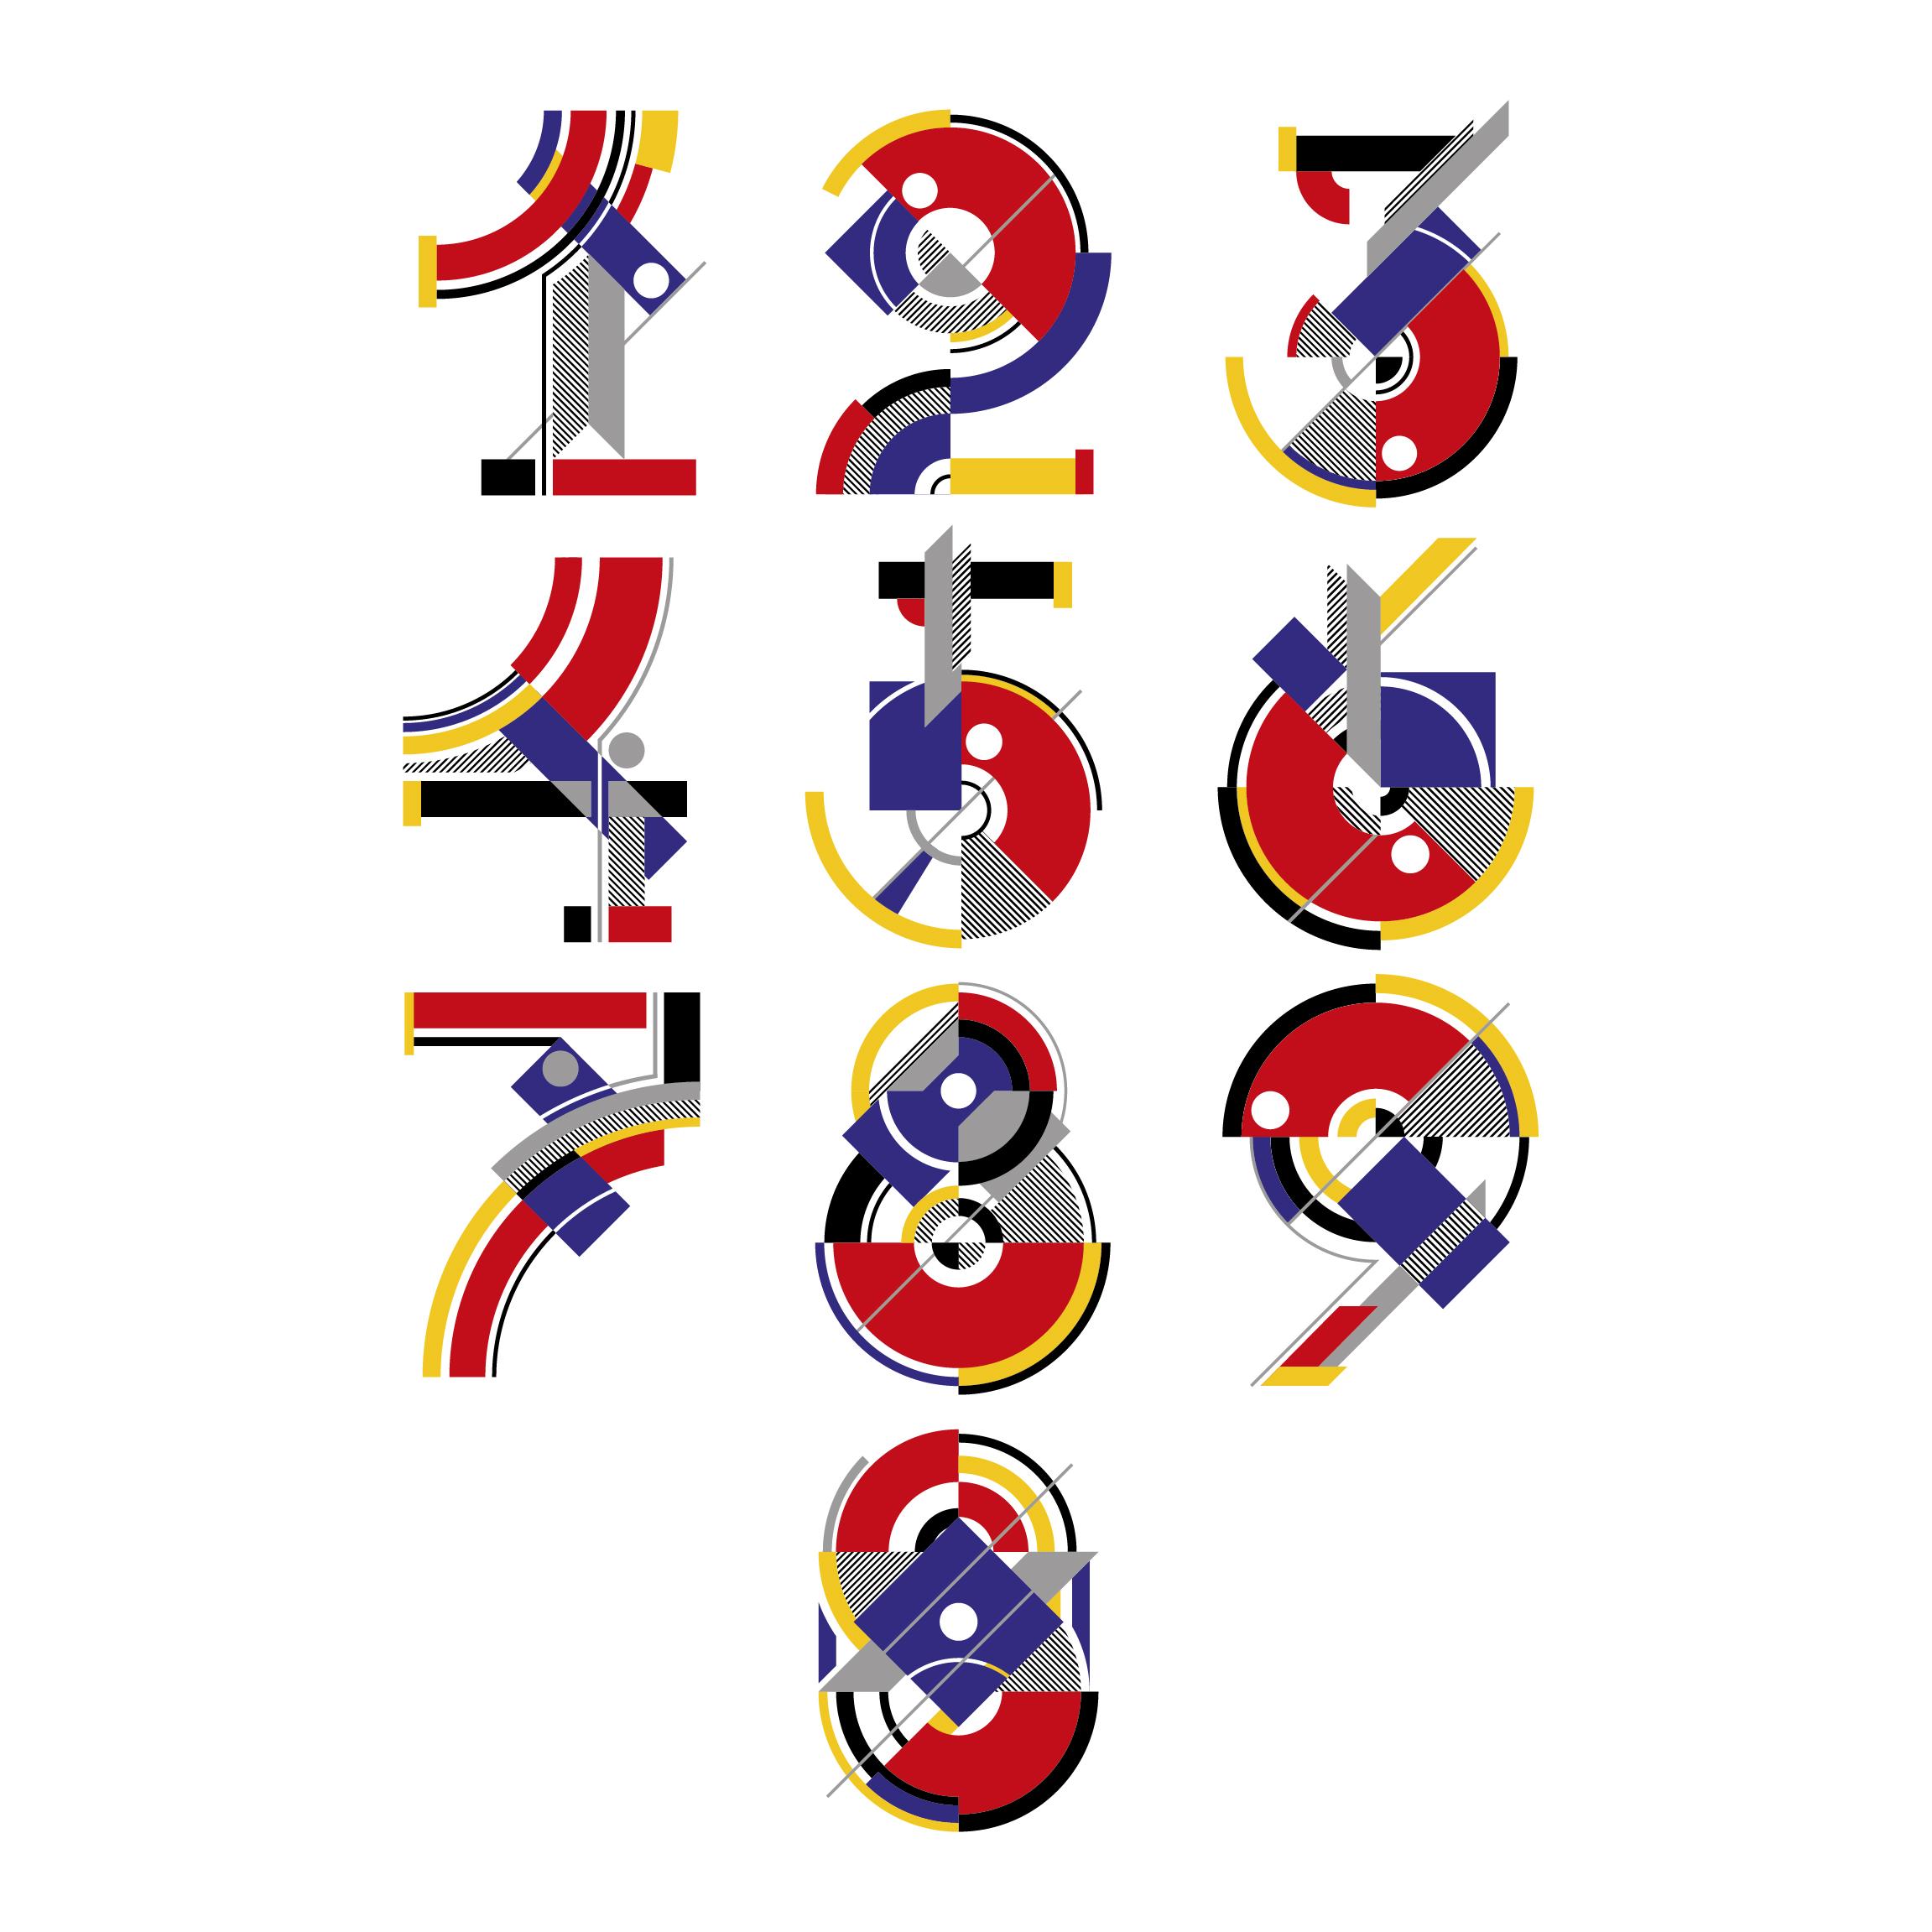 Yorokobu - Numerografía 68 by Jorge Gallardo - Creative Work - $i